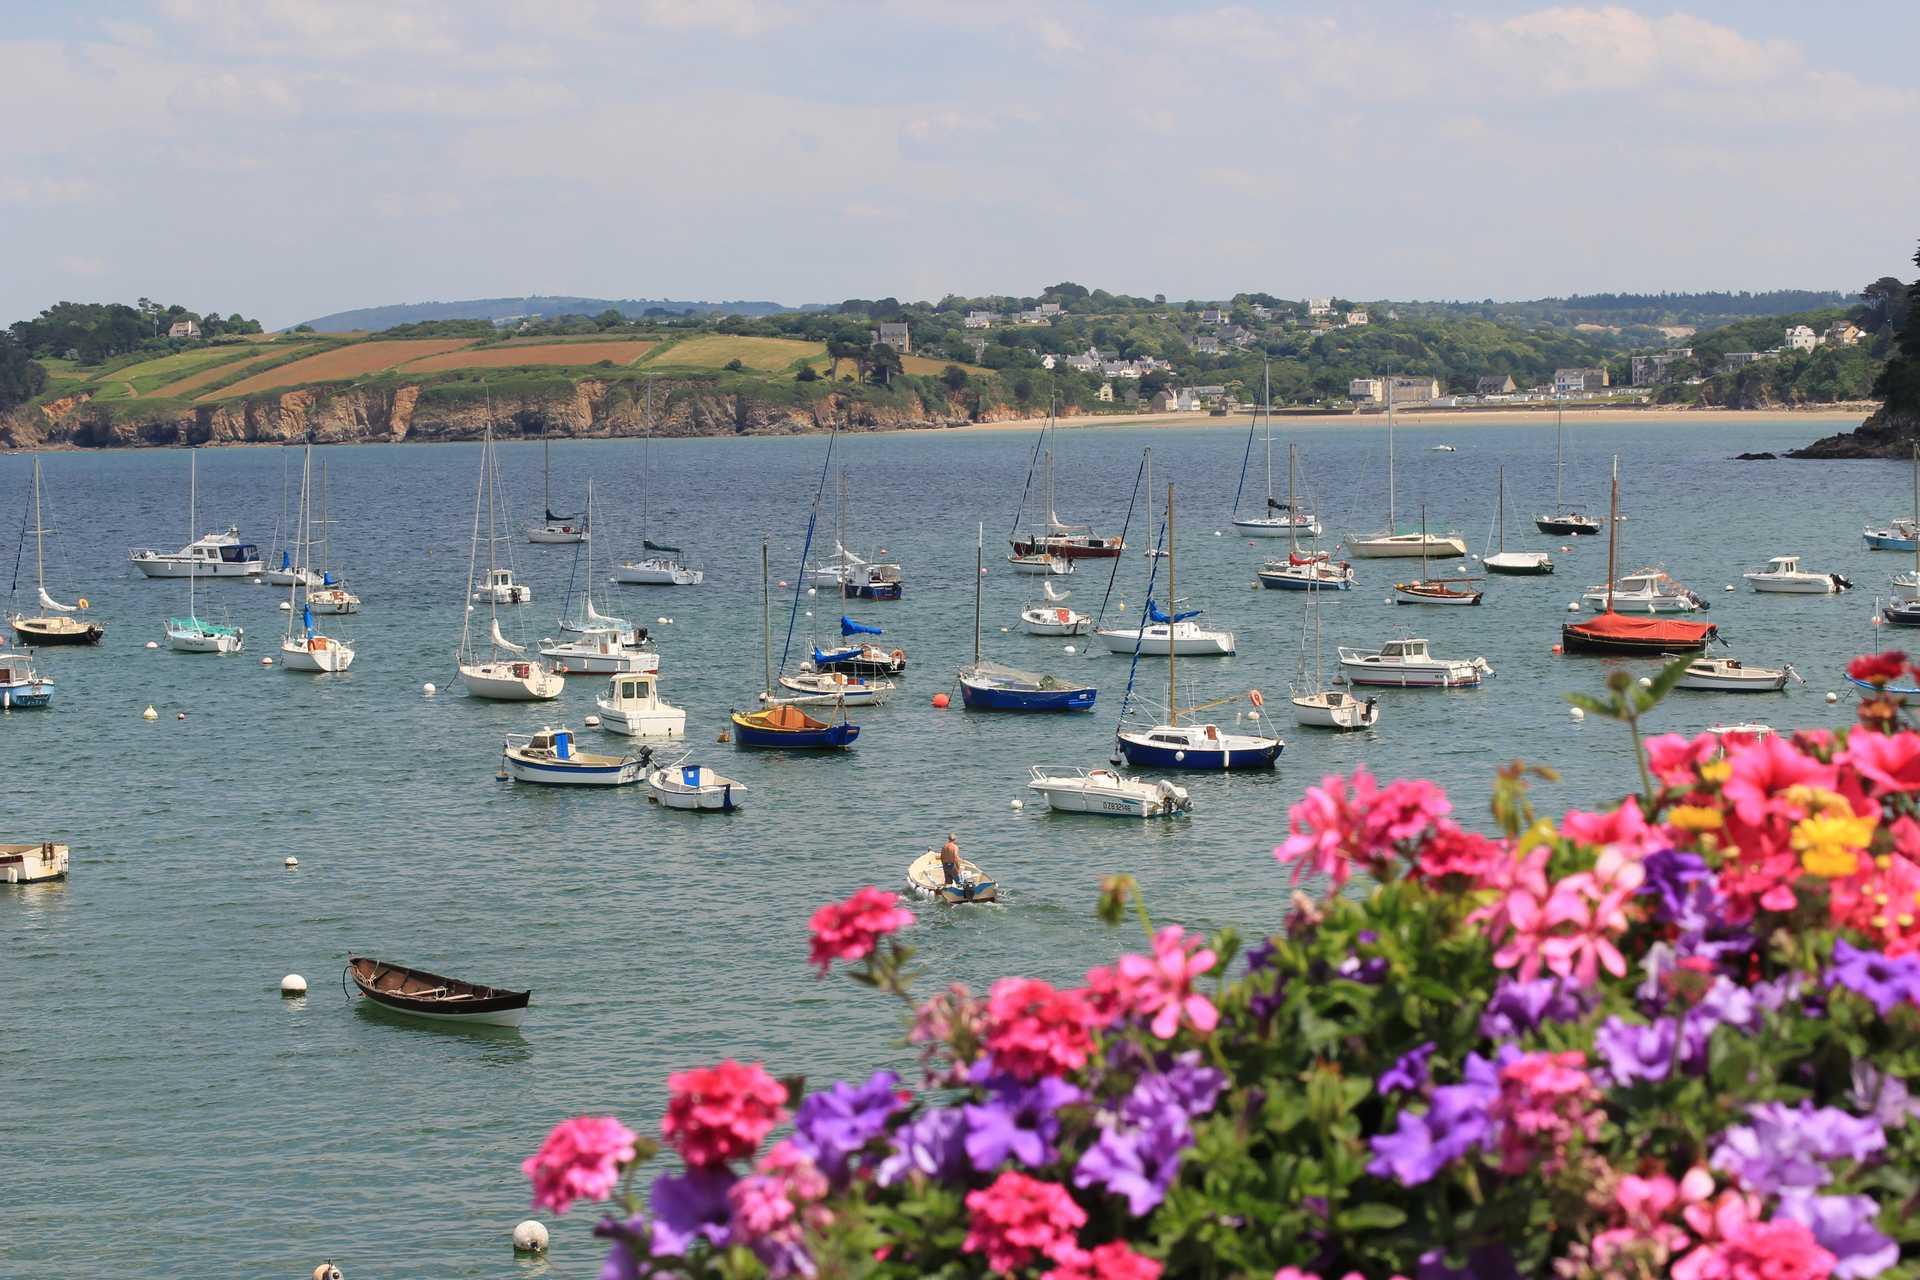 fleurs en premier plan et petit port breton en fond